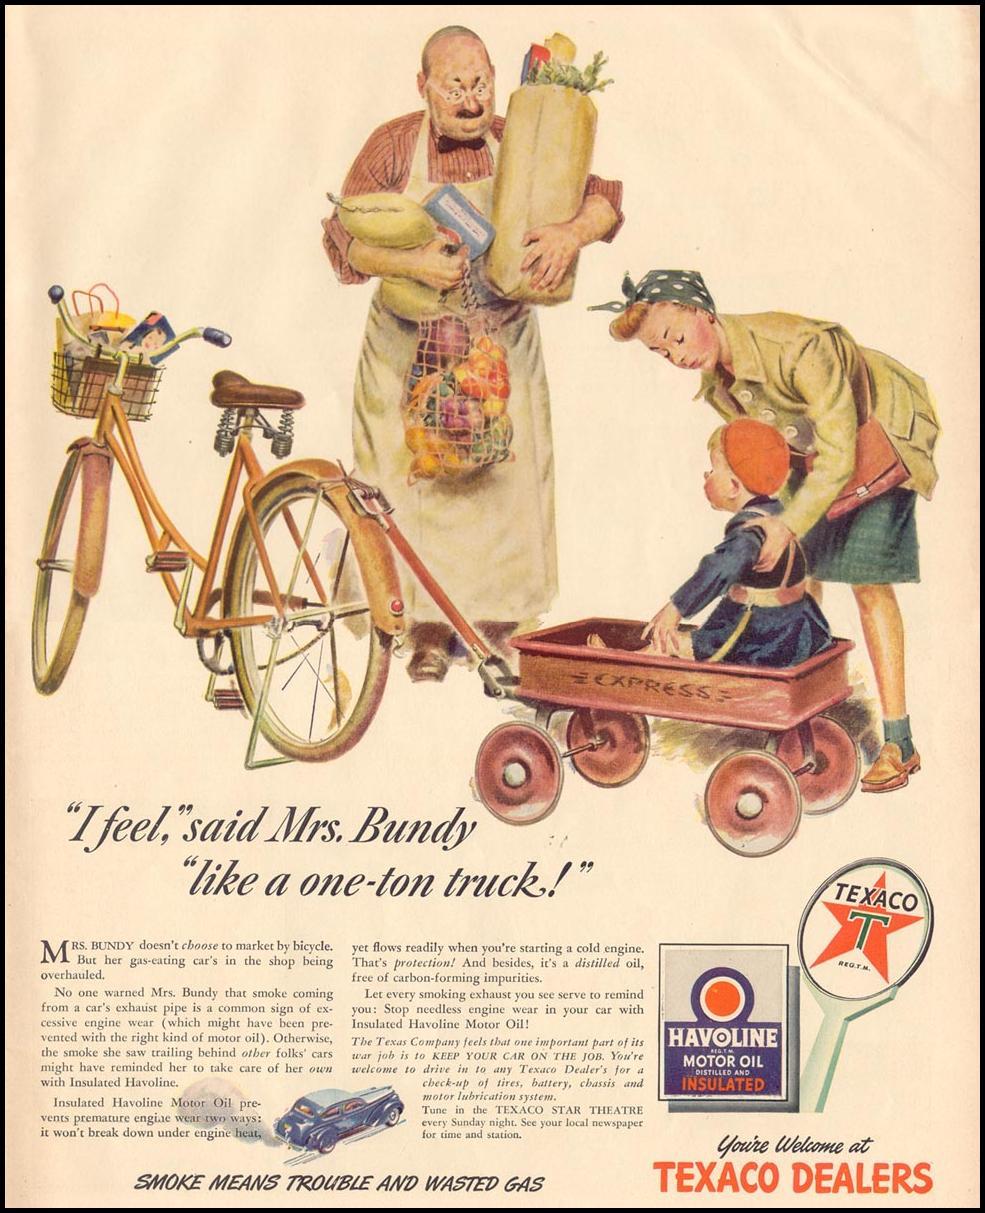 HAVOLINE MOTOR OIL LIFE 11/08/1943